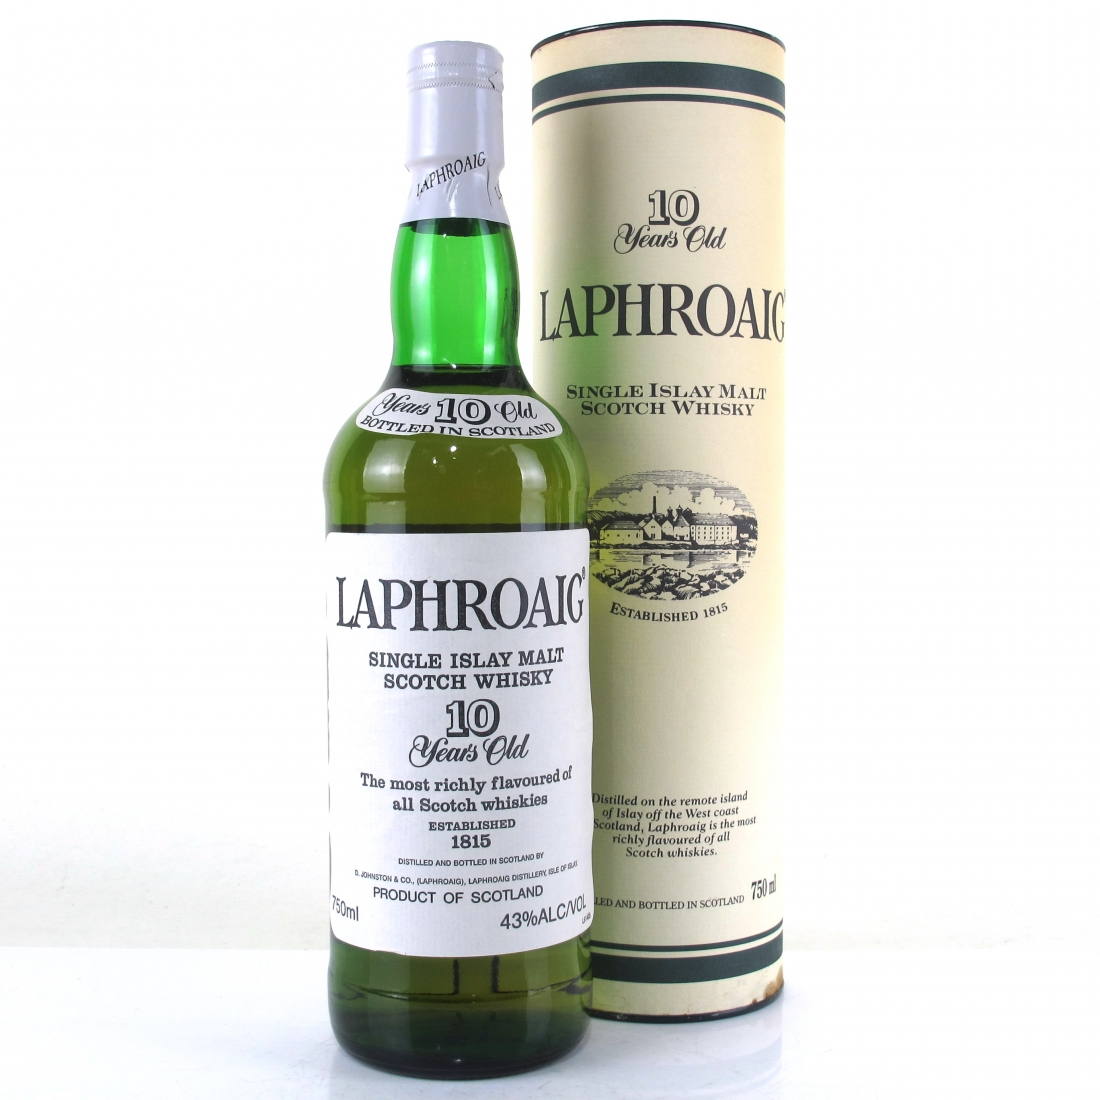 Laphroaig 10 Year Old Pre-Royal Warrant 75cl / US Import